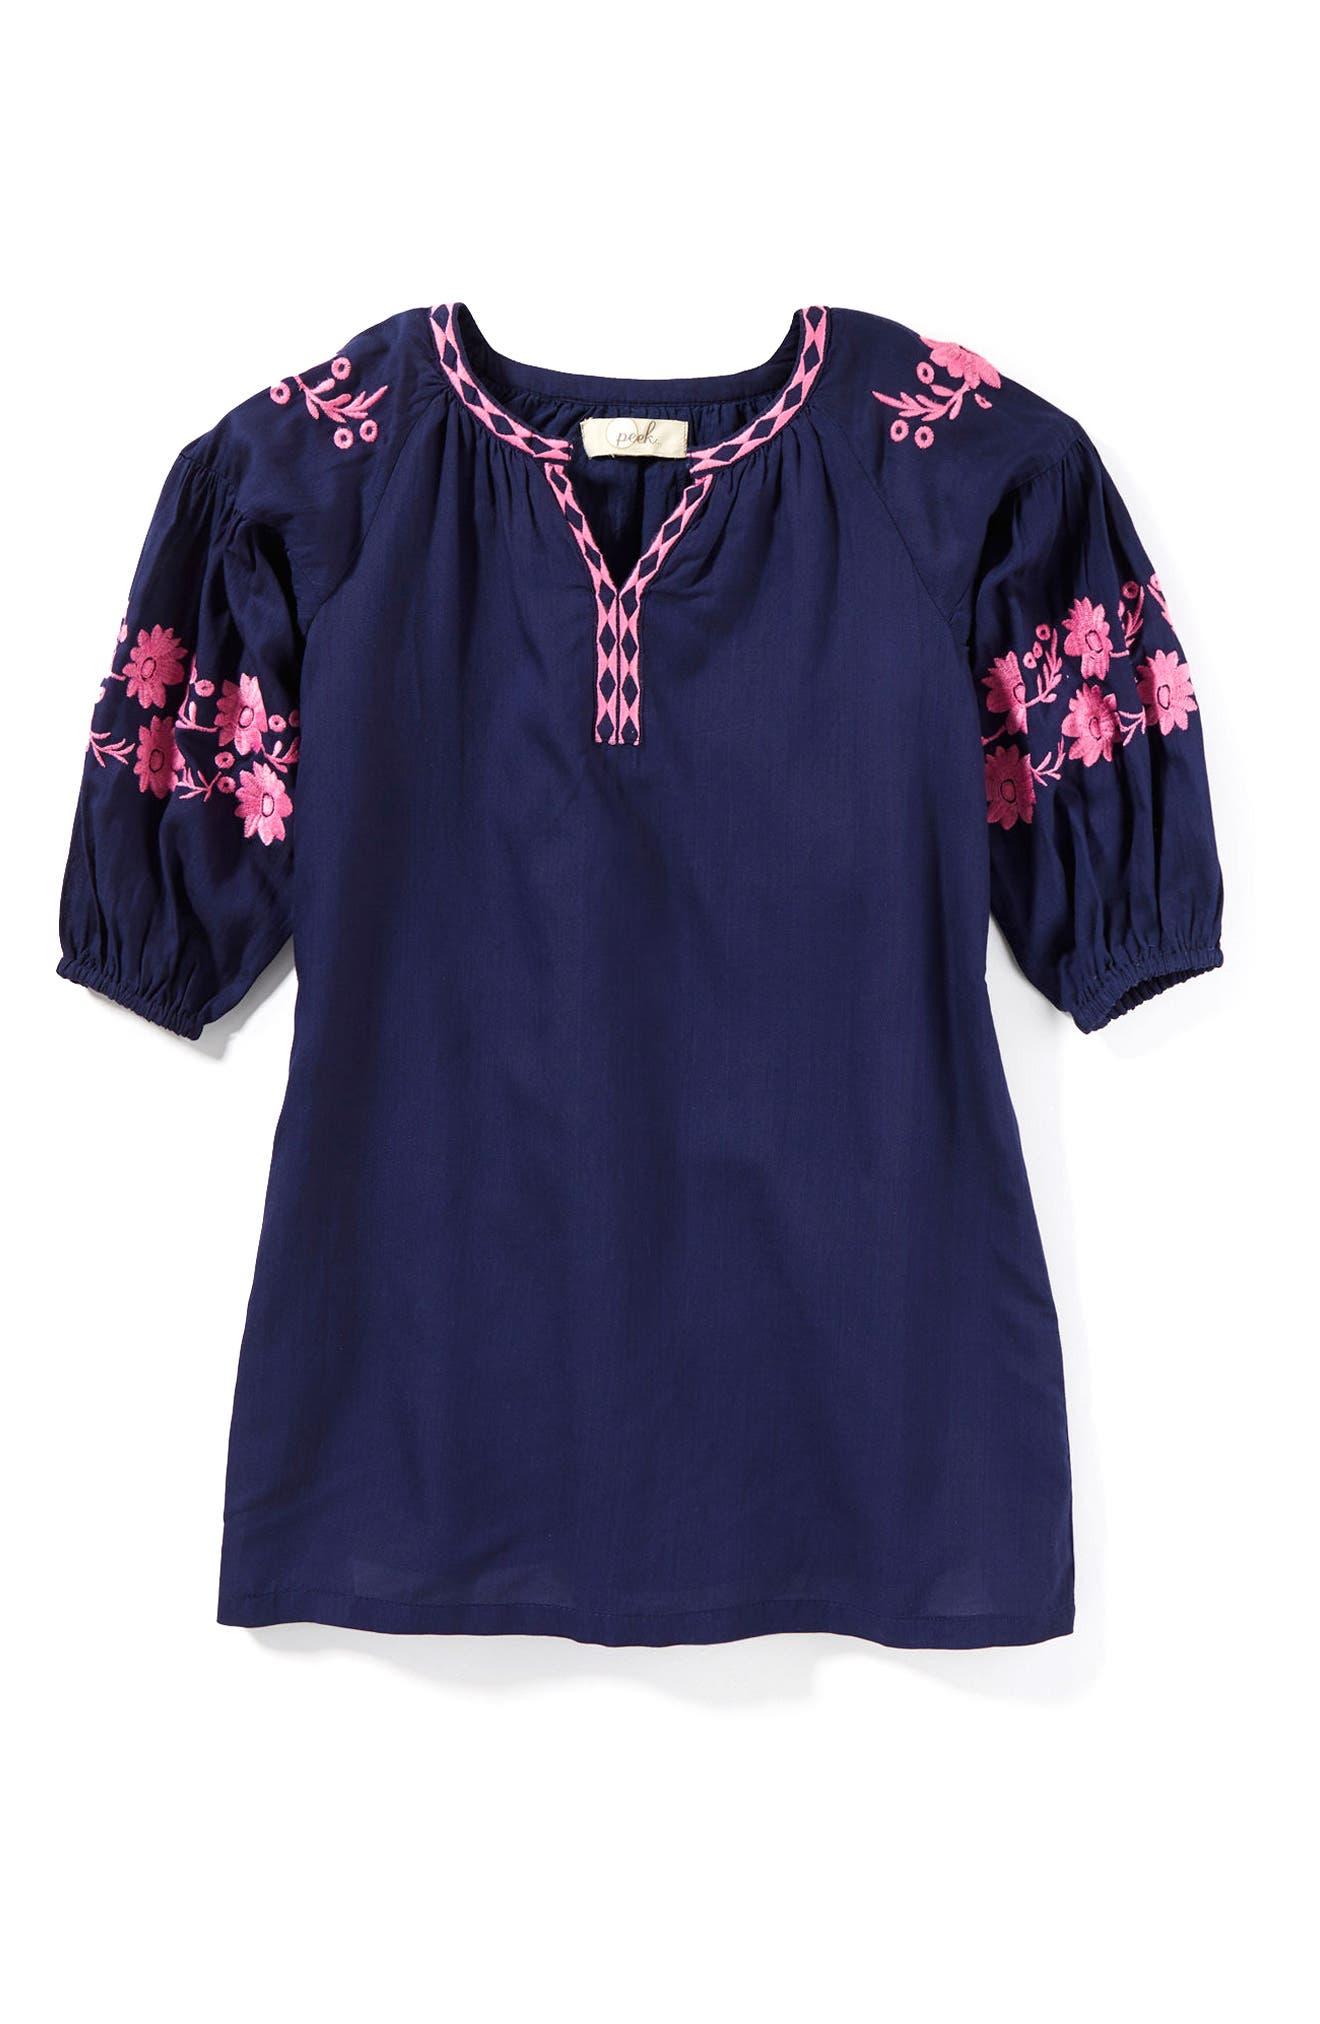 Main Image - Peek Lidia Embroidered Dress (Toddler Girls, Little Girls & Big Girls)